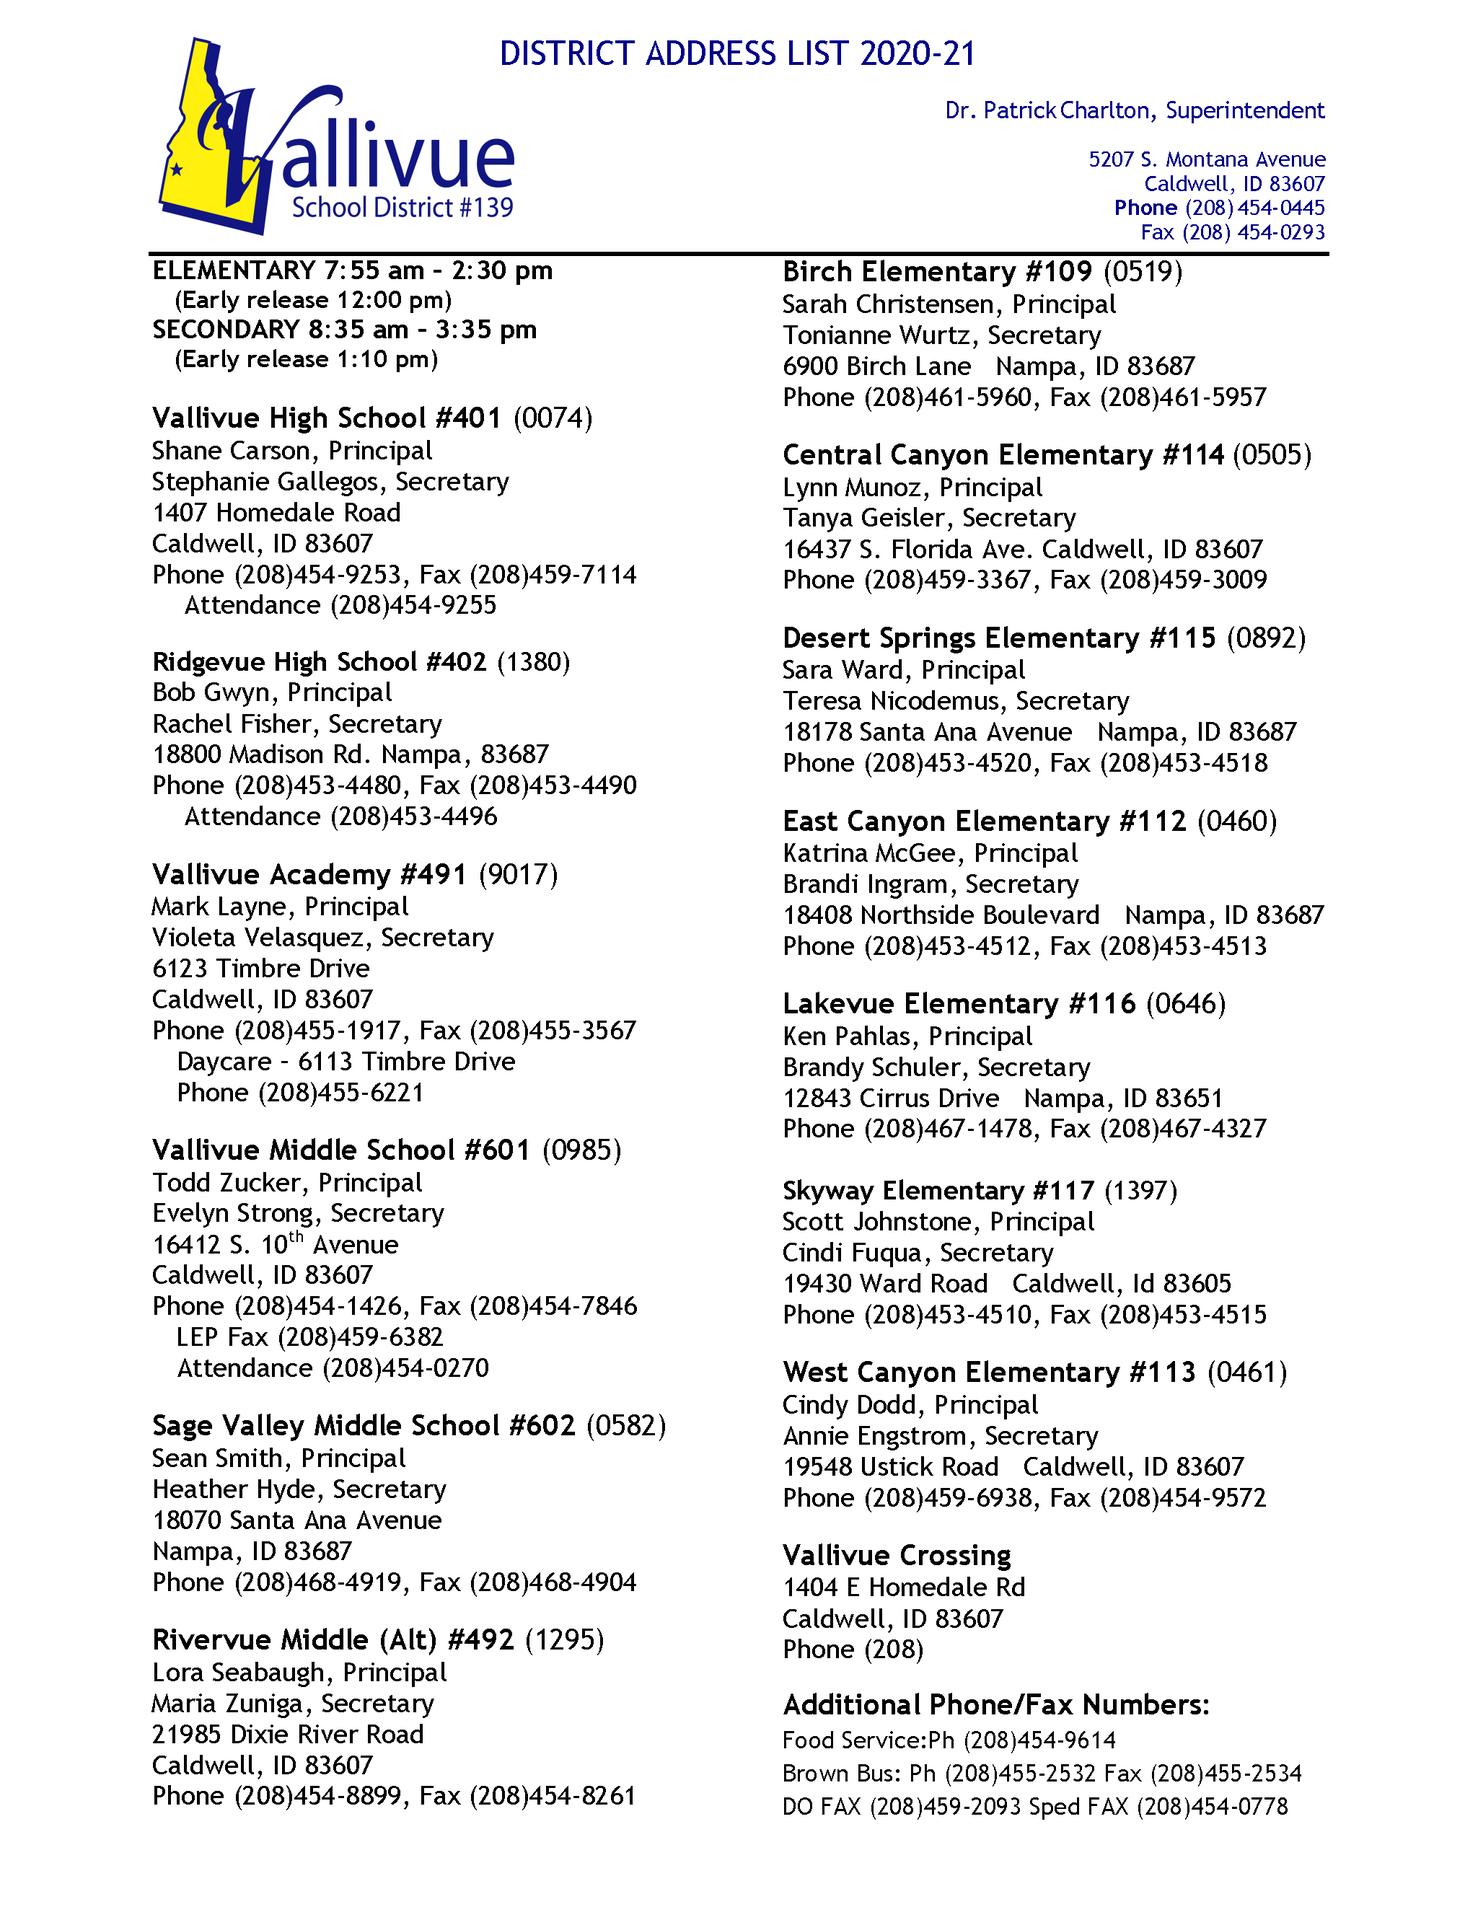 District Address List